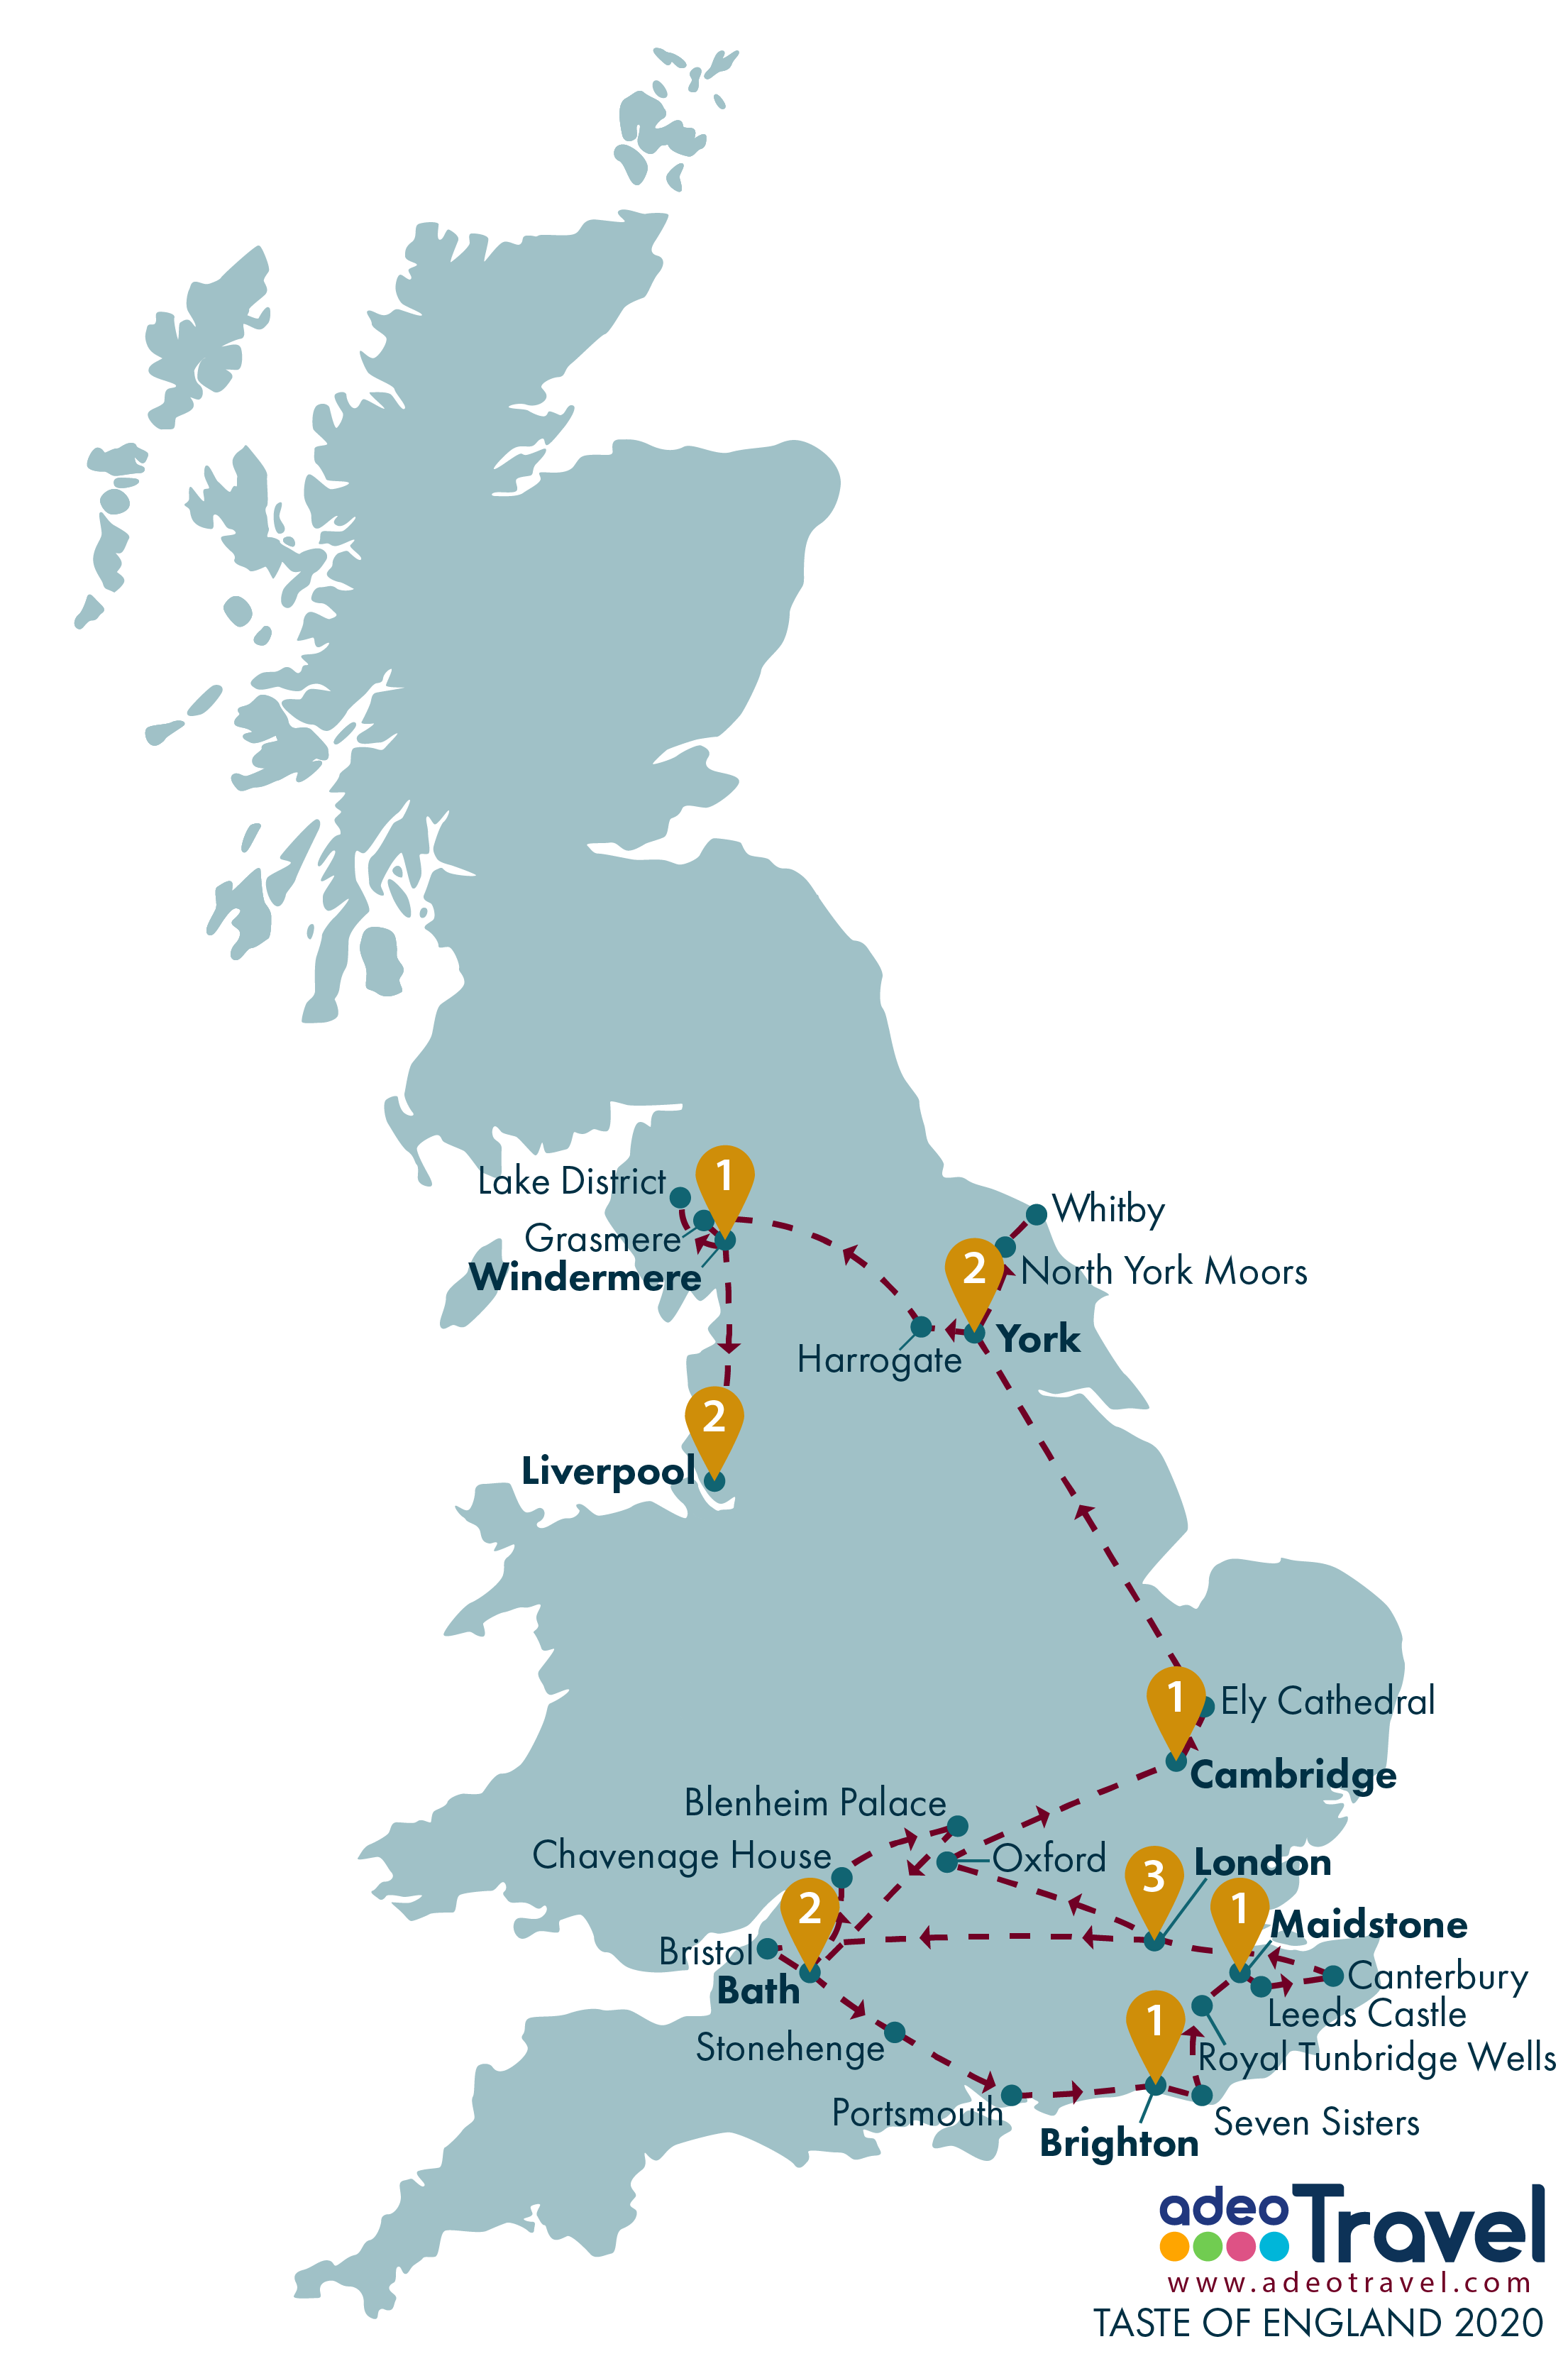 Map - Taste of England 2020